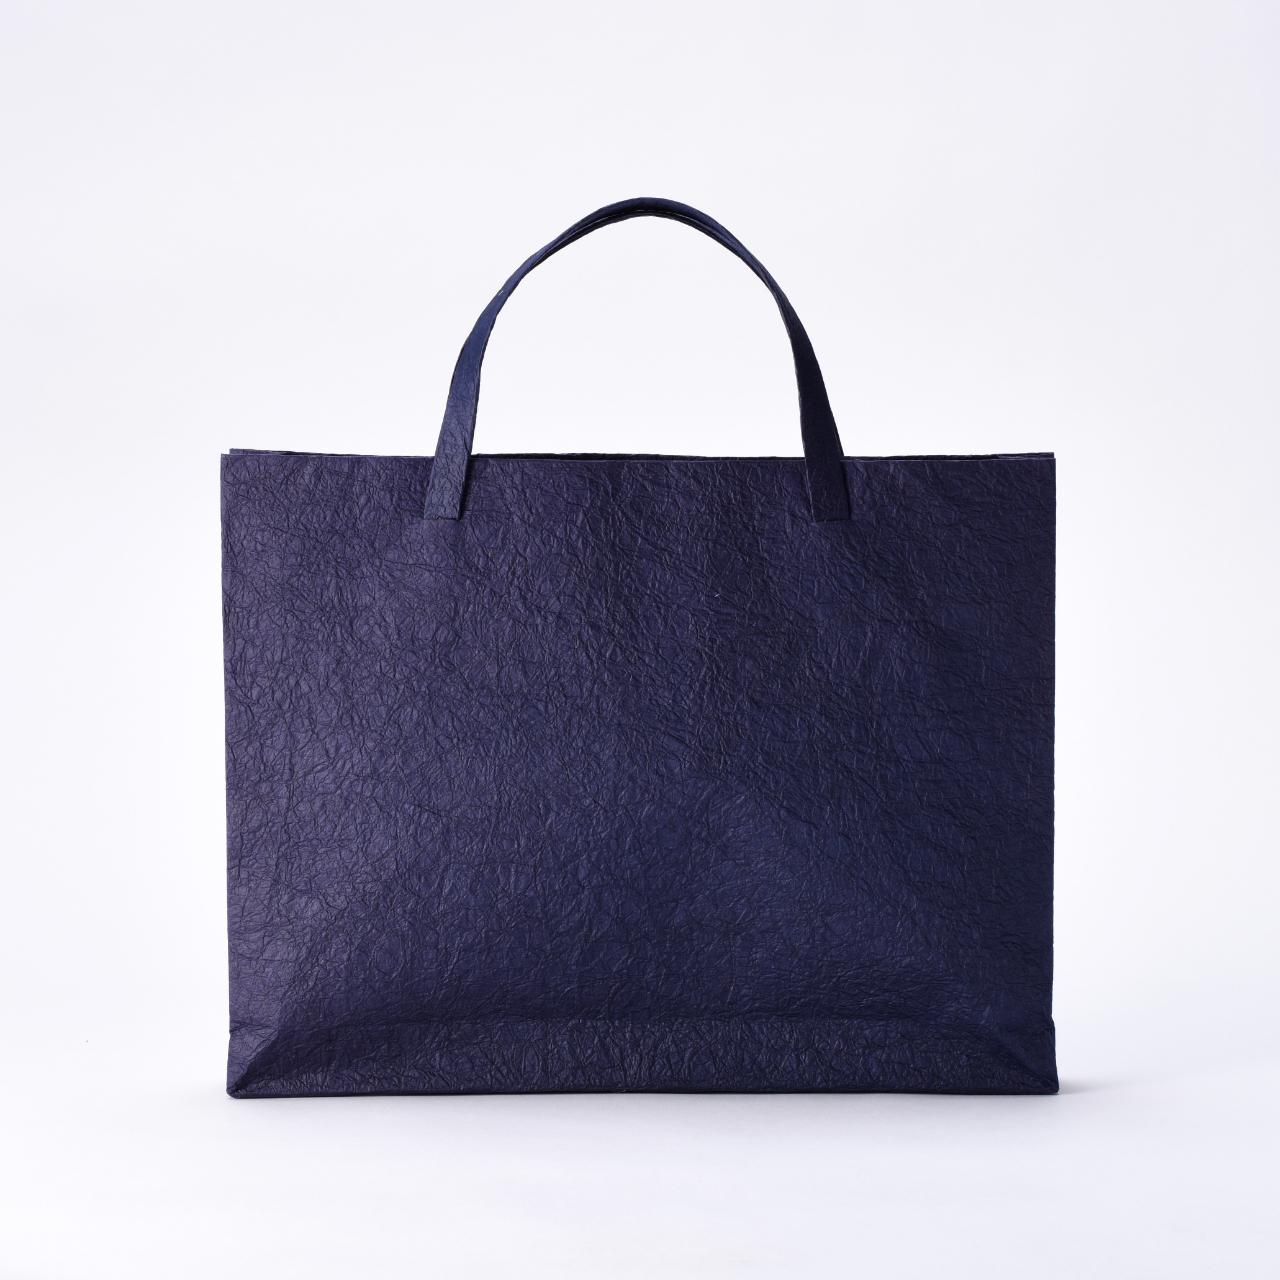 手提げ鞄(紺)